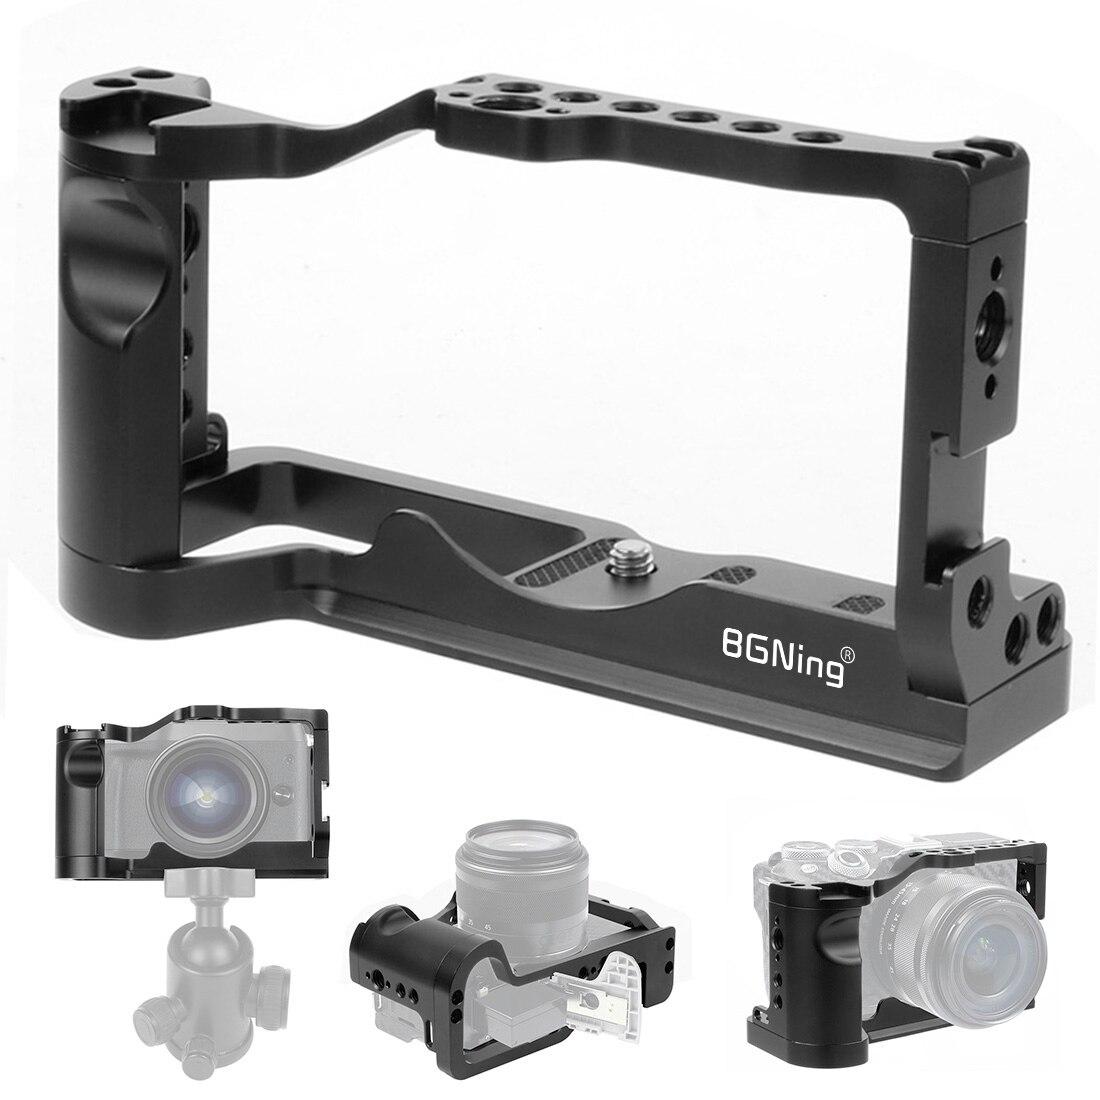 BGNing هيكل قفصي الشكل للكاميرا تلاعب لكانون M6 الثاني مع 38 مللي متر الناتو السكك الحديدية الباردة الحذاء جبل أري 1/4